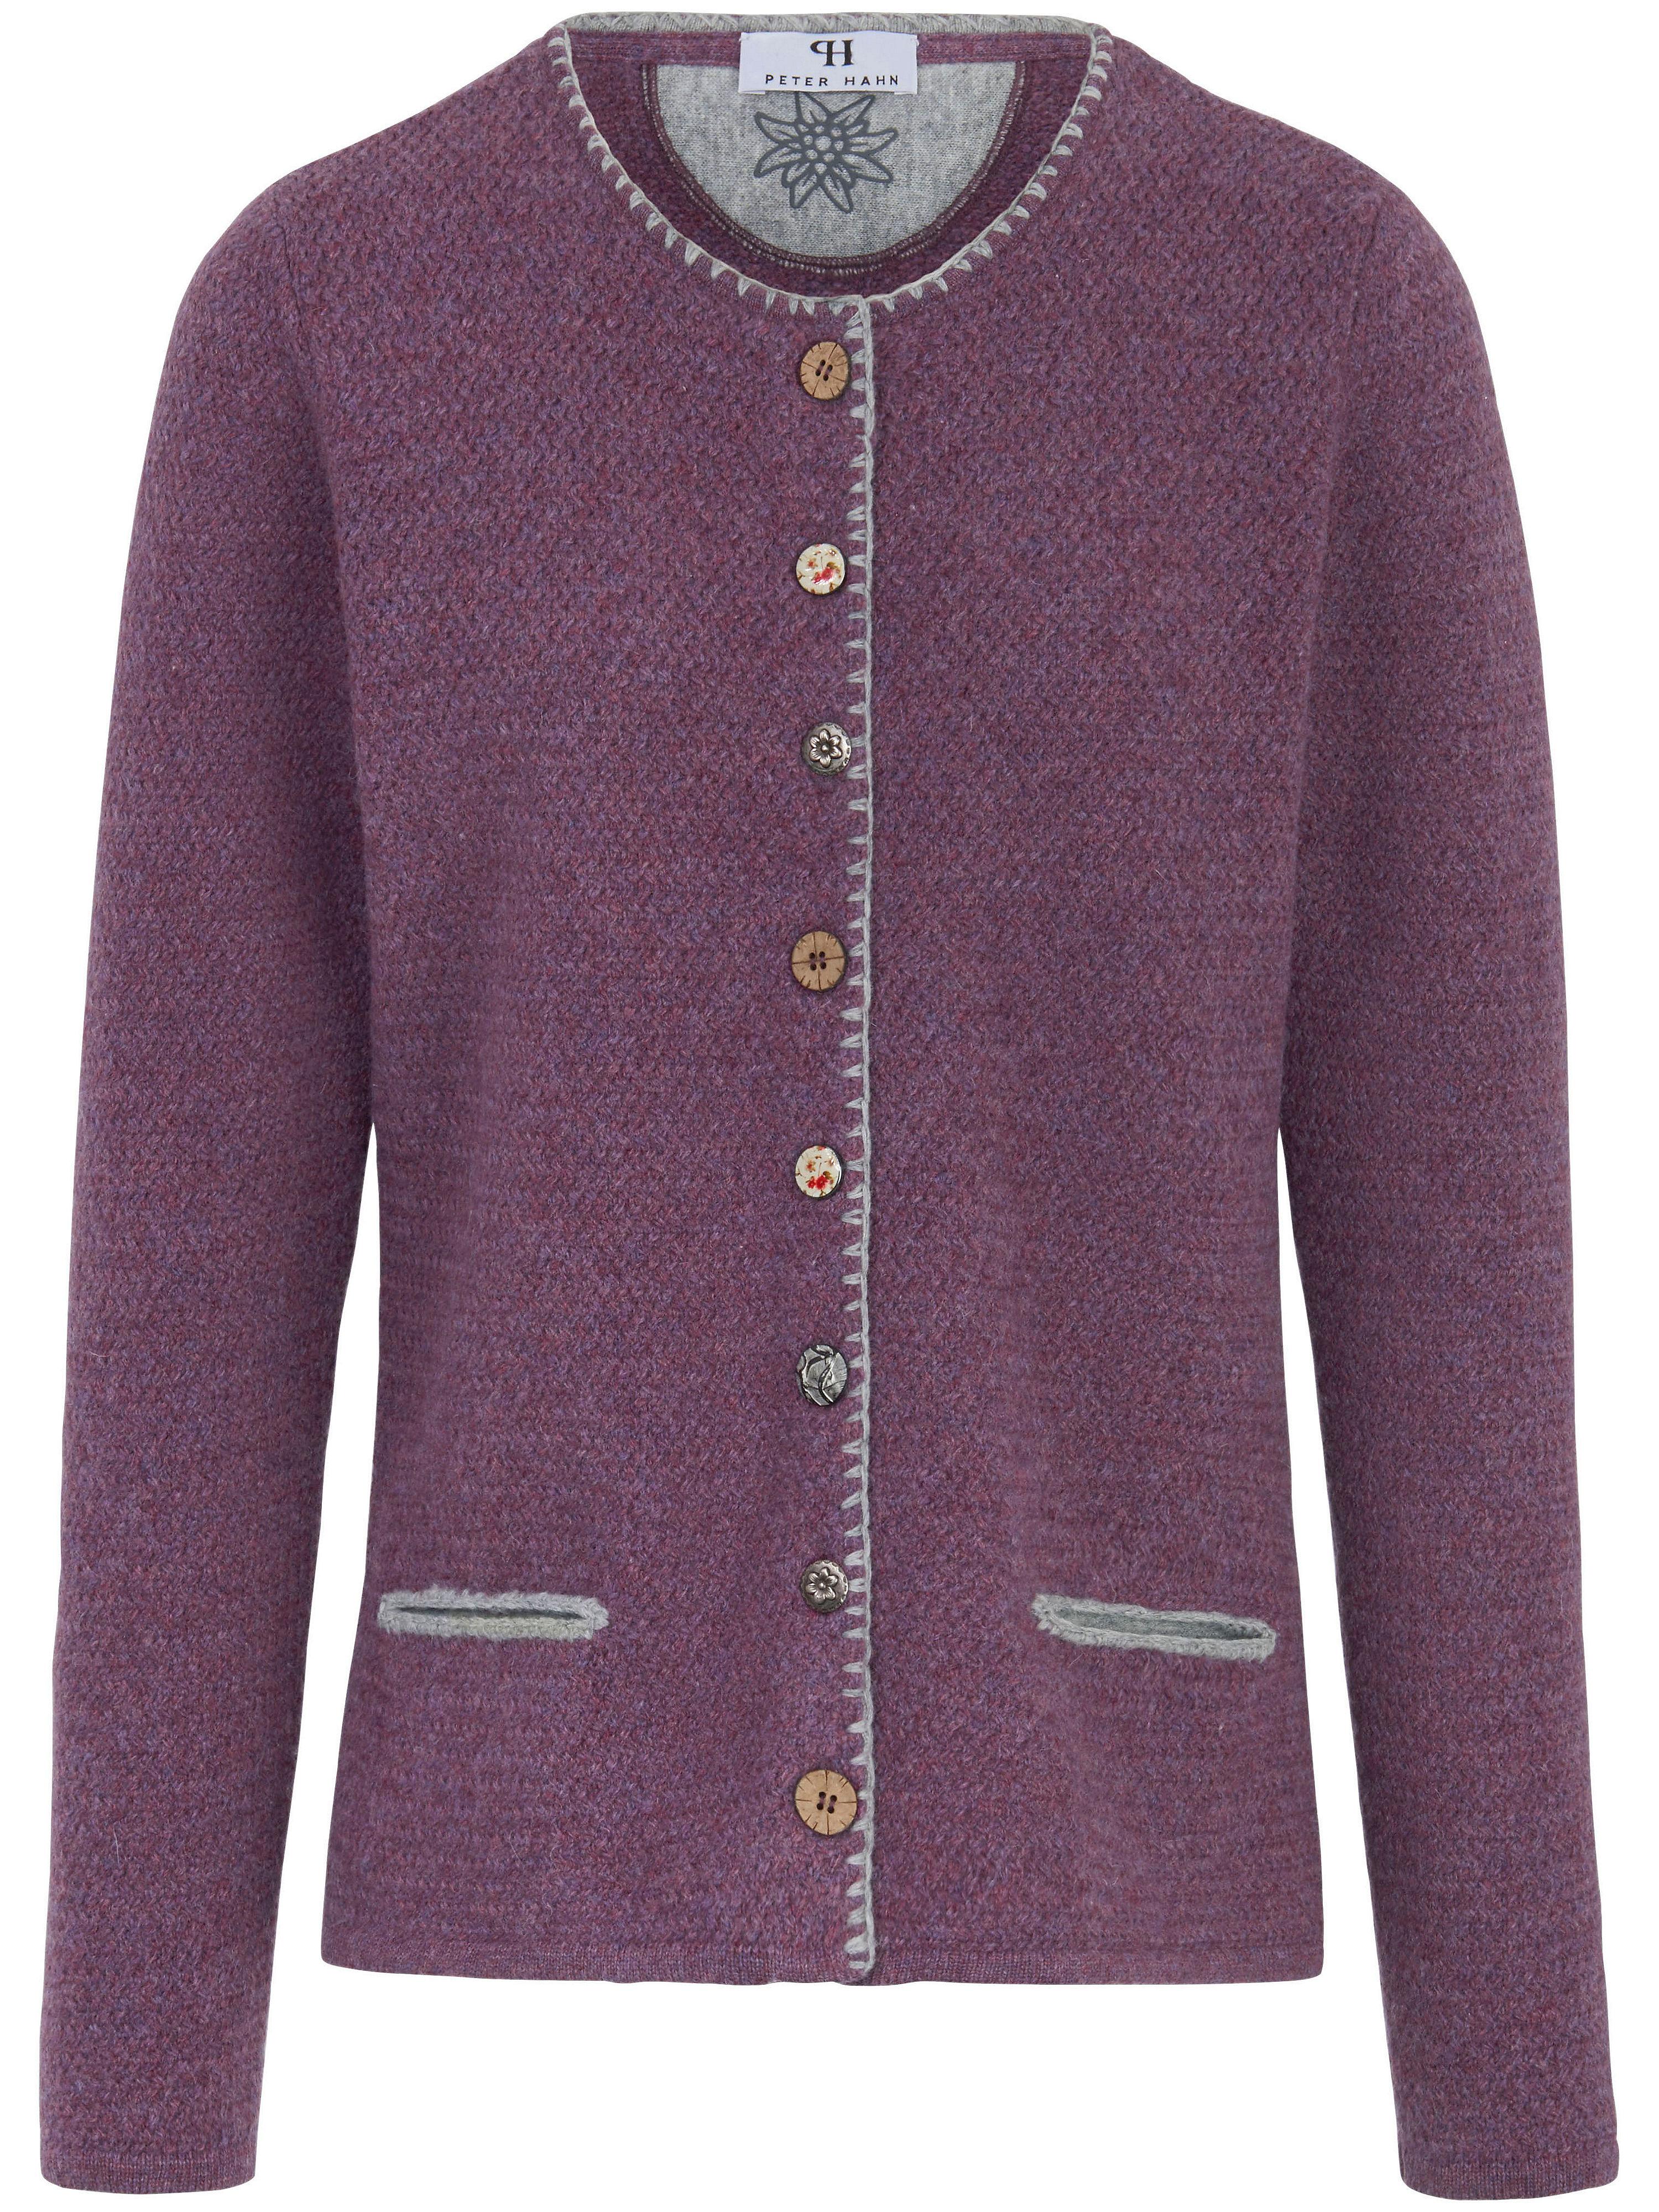 Image of   Cardigan i 100% ren ny uld Fra Peter Hahn lilla